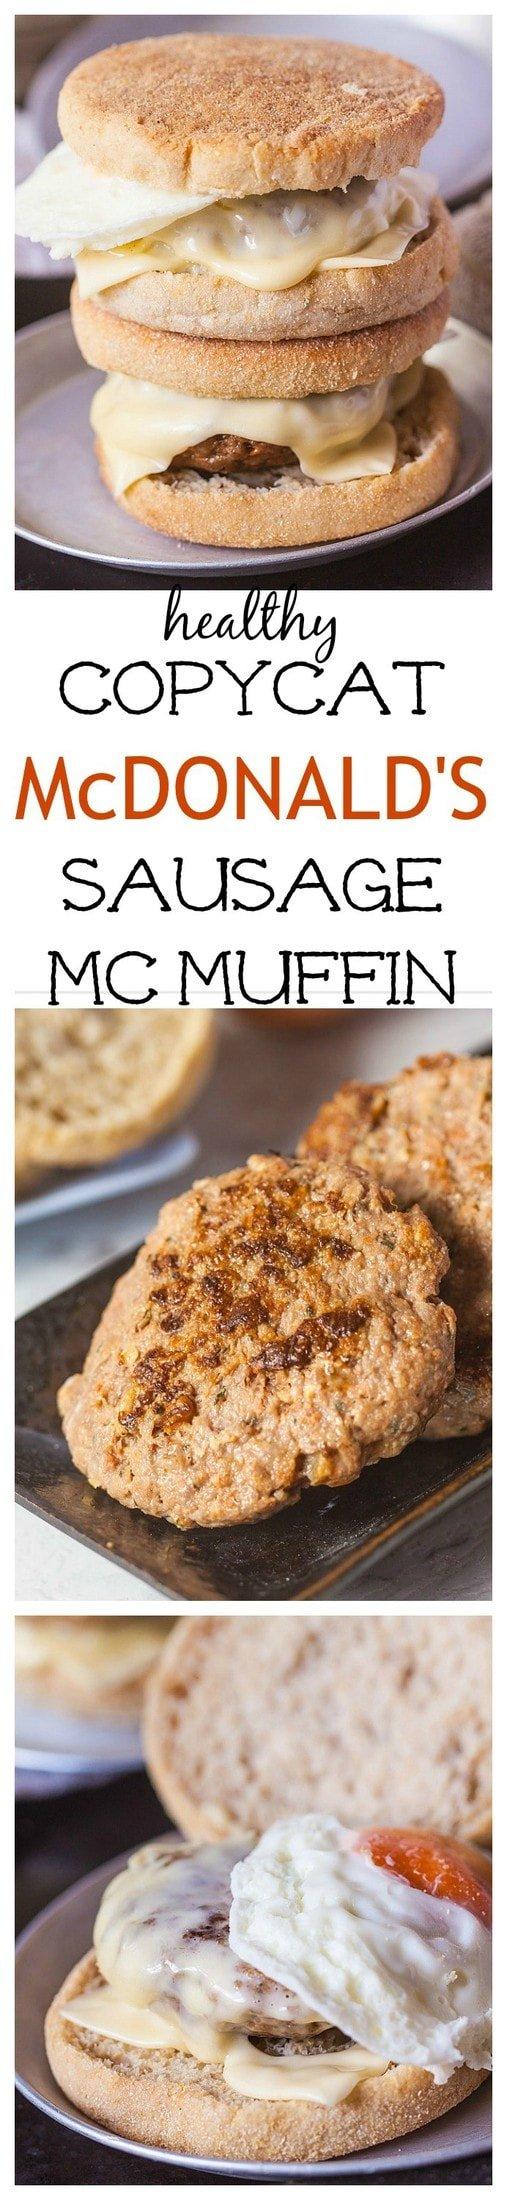 Mcdonalds muffin rezept